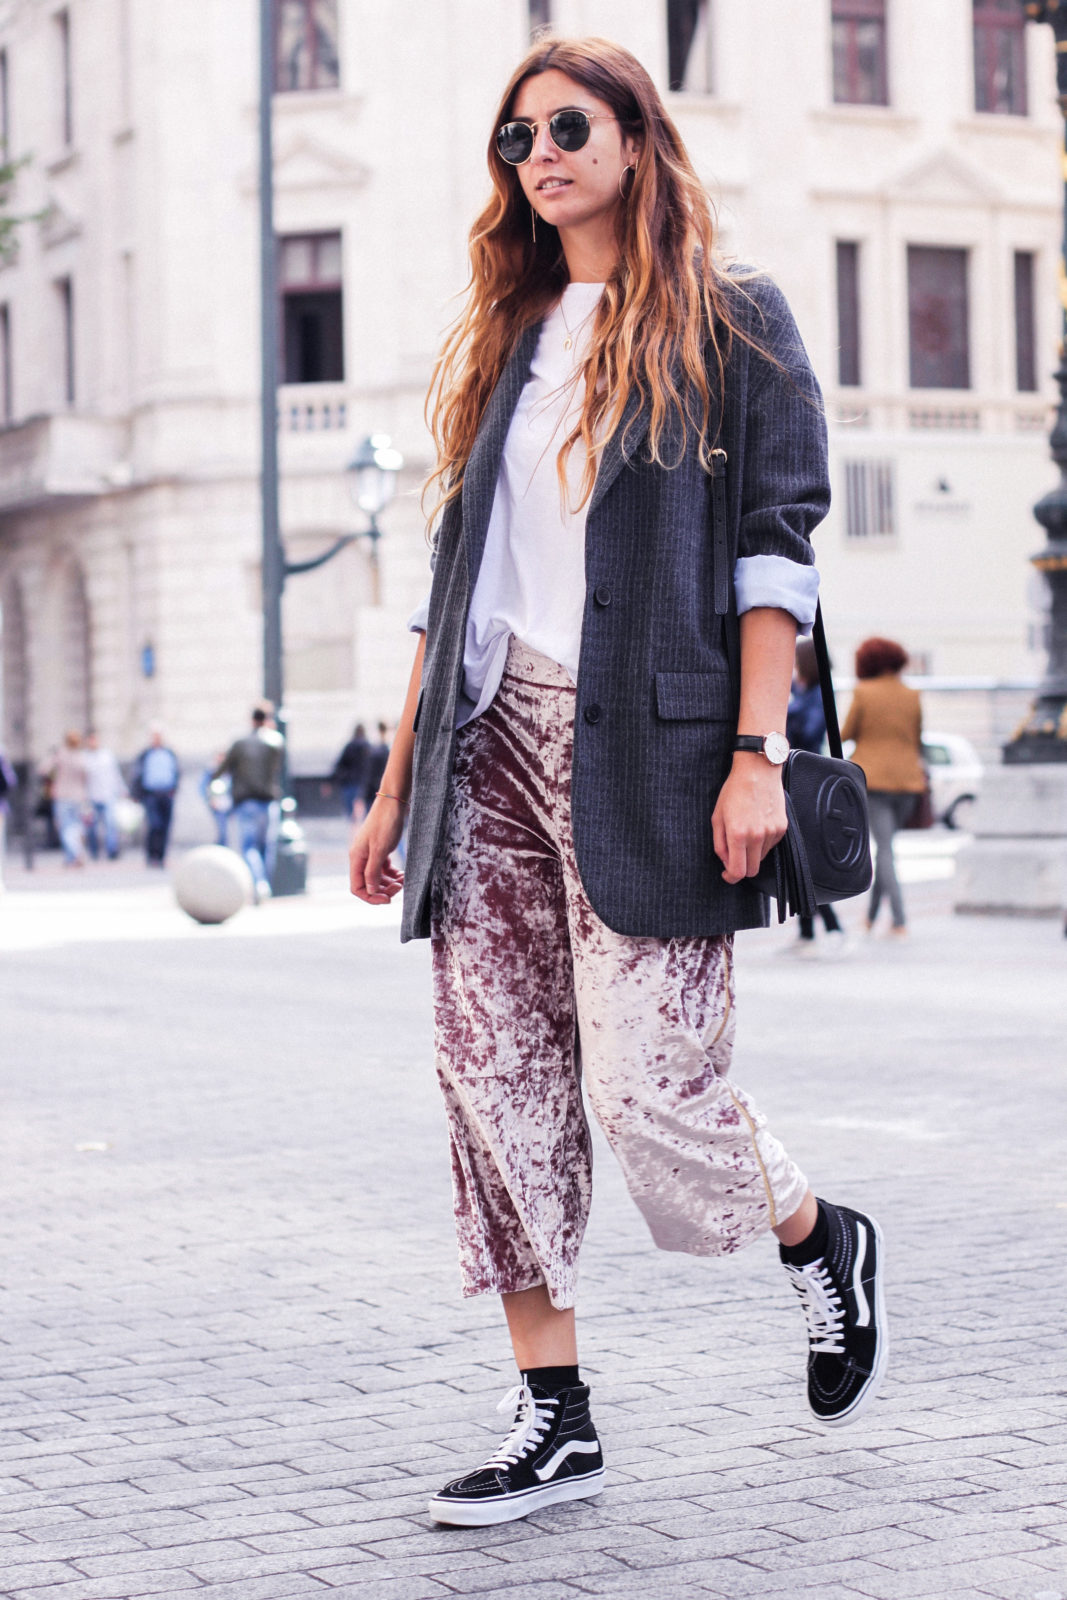 pantalones_terciopelo_rosa_pull_and_bear_blazer_vans_pendientes_aros_gucci-45